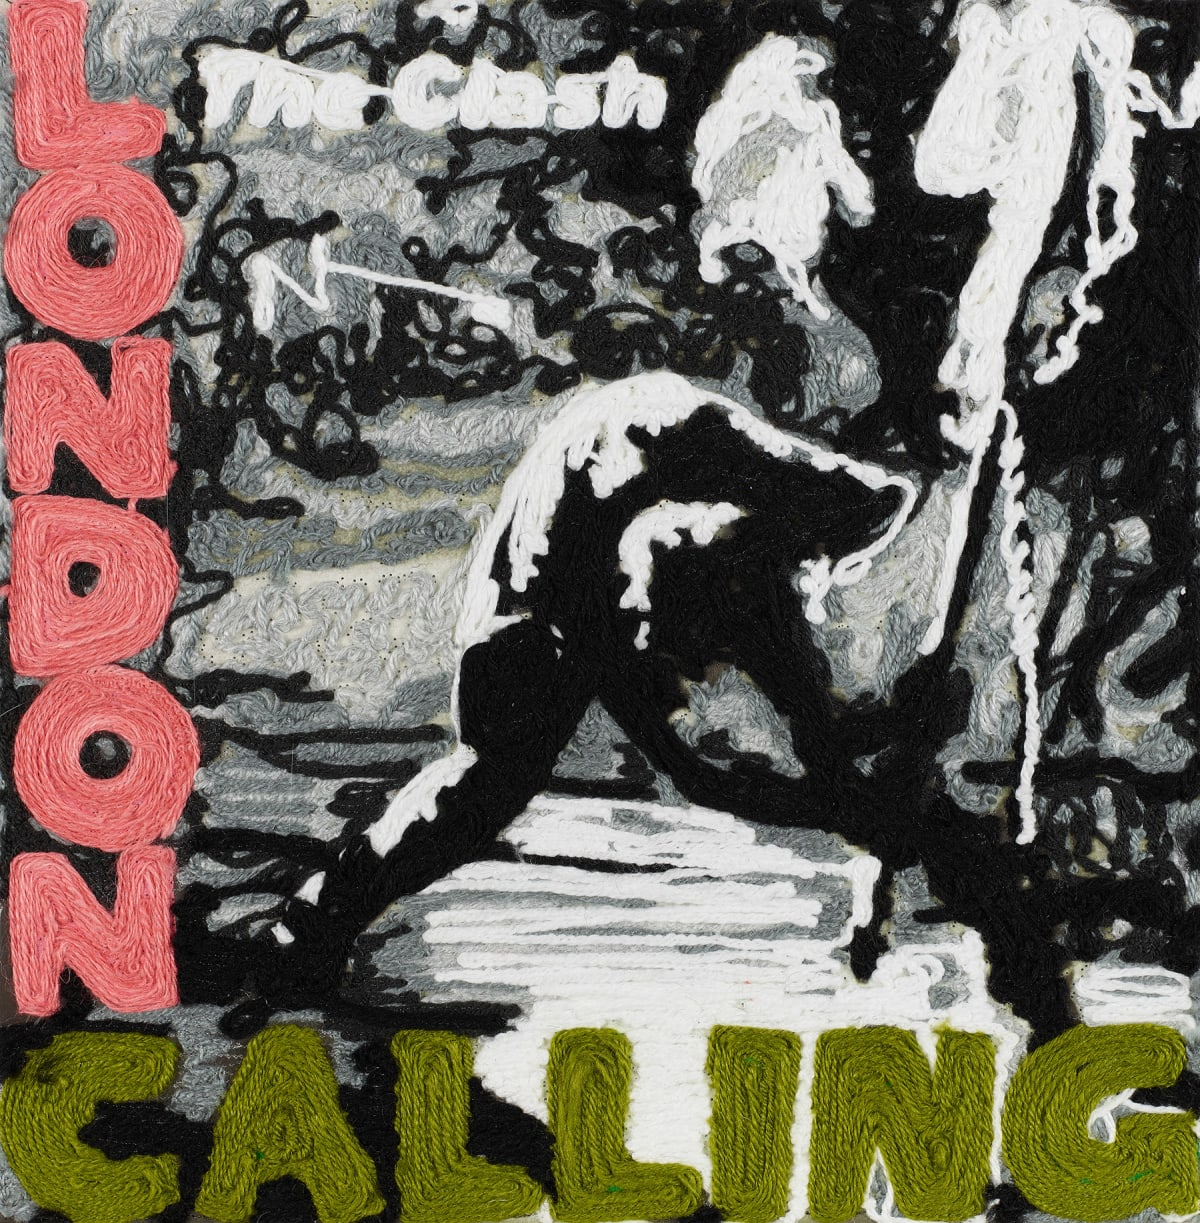 Stephen Wilson, London Calling, The Clash , 2019